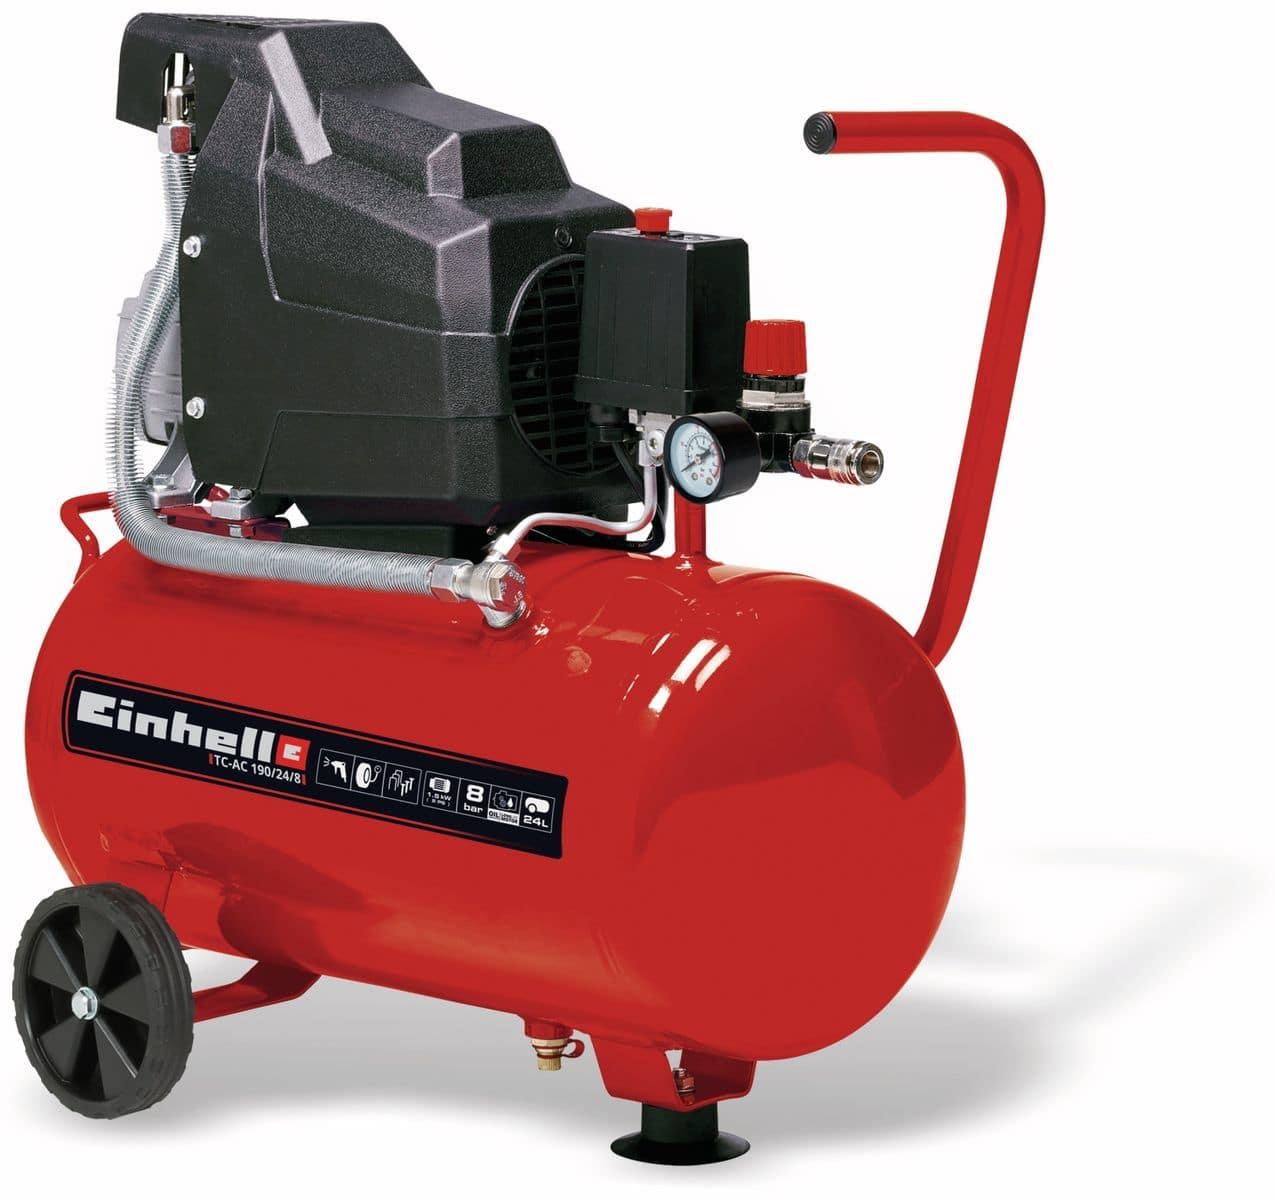 Omtyckta Luft-Kompressor EINHELL TC-AC 190/24, rot/schwarz, 230V~, 1500 W AF-29